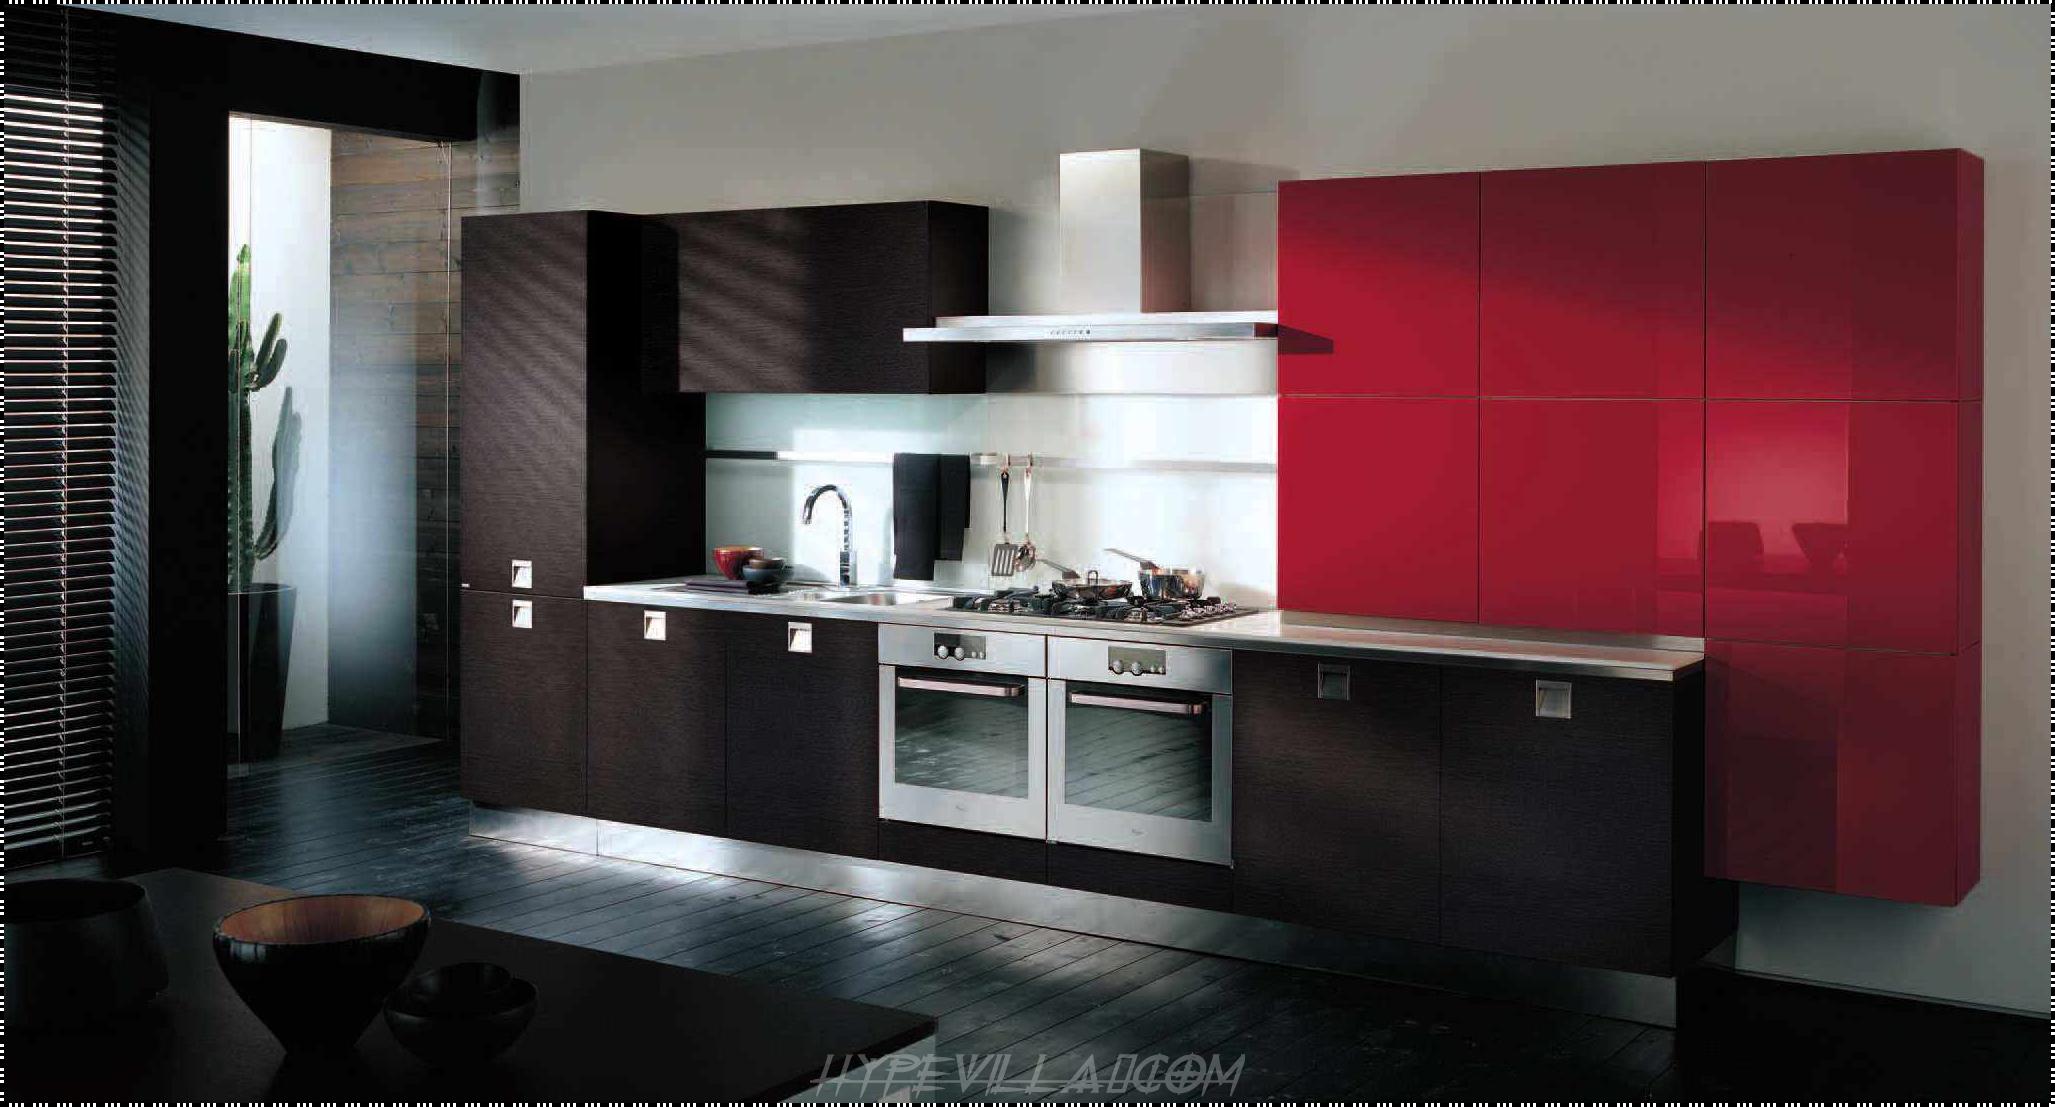 Kitchen interiors also for the home design decor dan rh pinterest